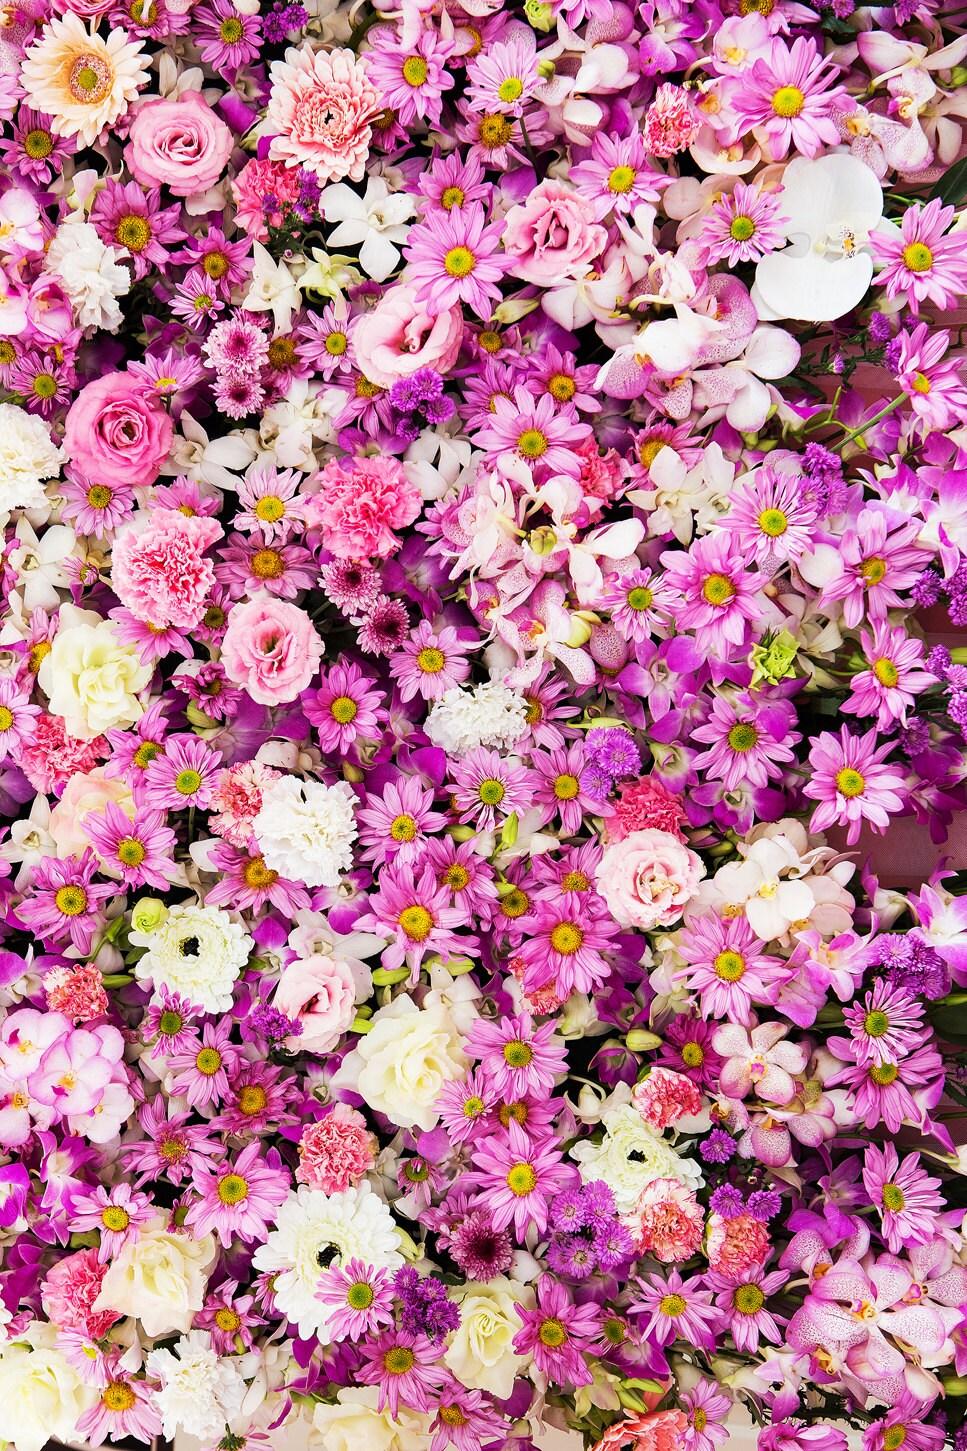 Sunflower Backdrop Chrysanthemum wedding romantic scene | Etsy